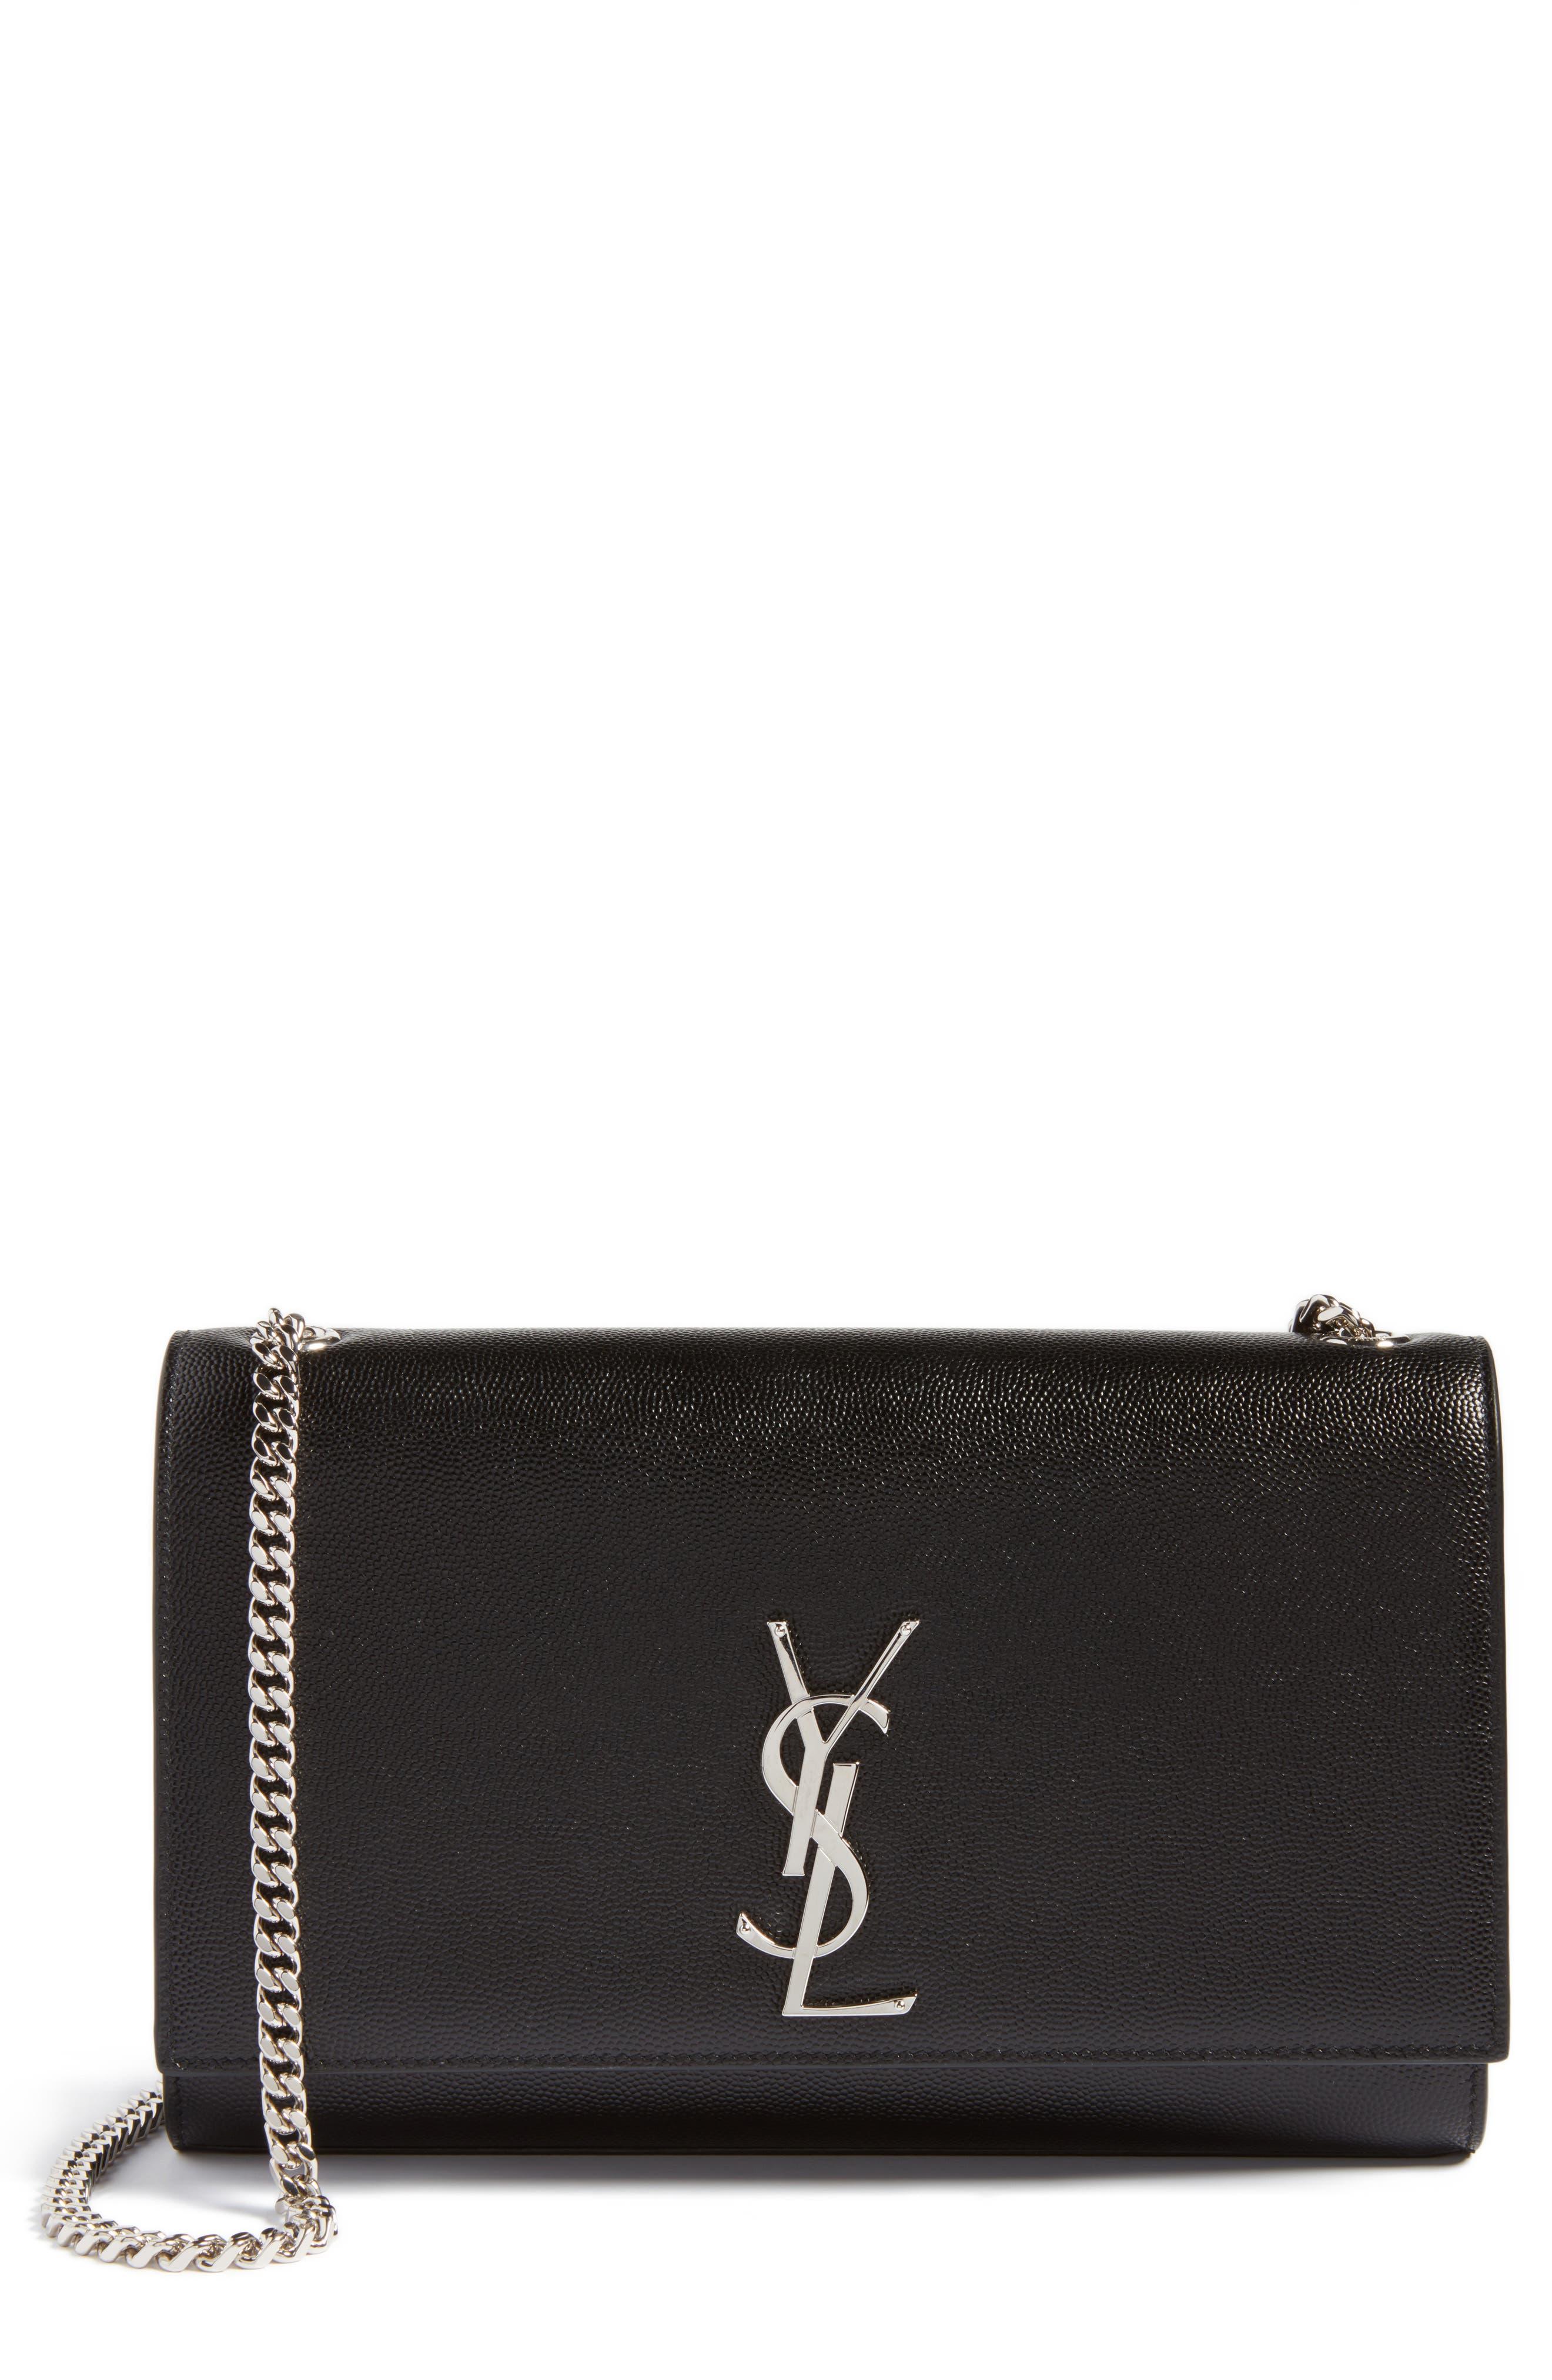 SAINT LAURENT Medium Kate Calfskin Leather Shoulder Bag, Main, color, NERO